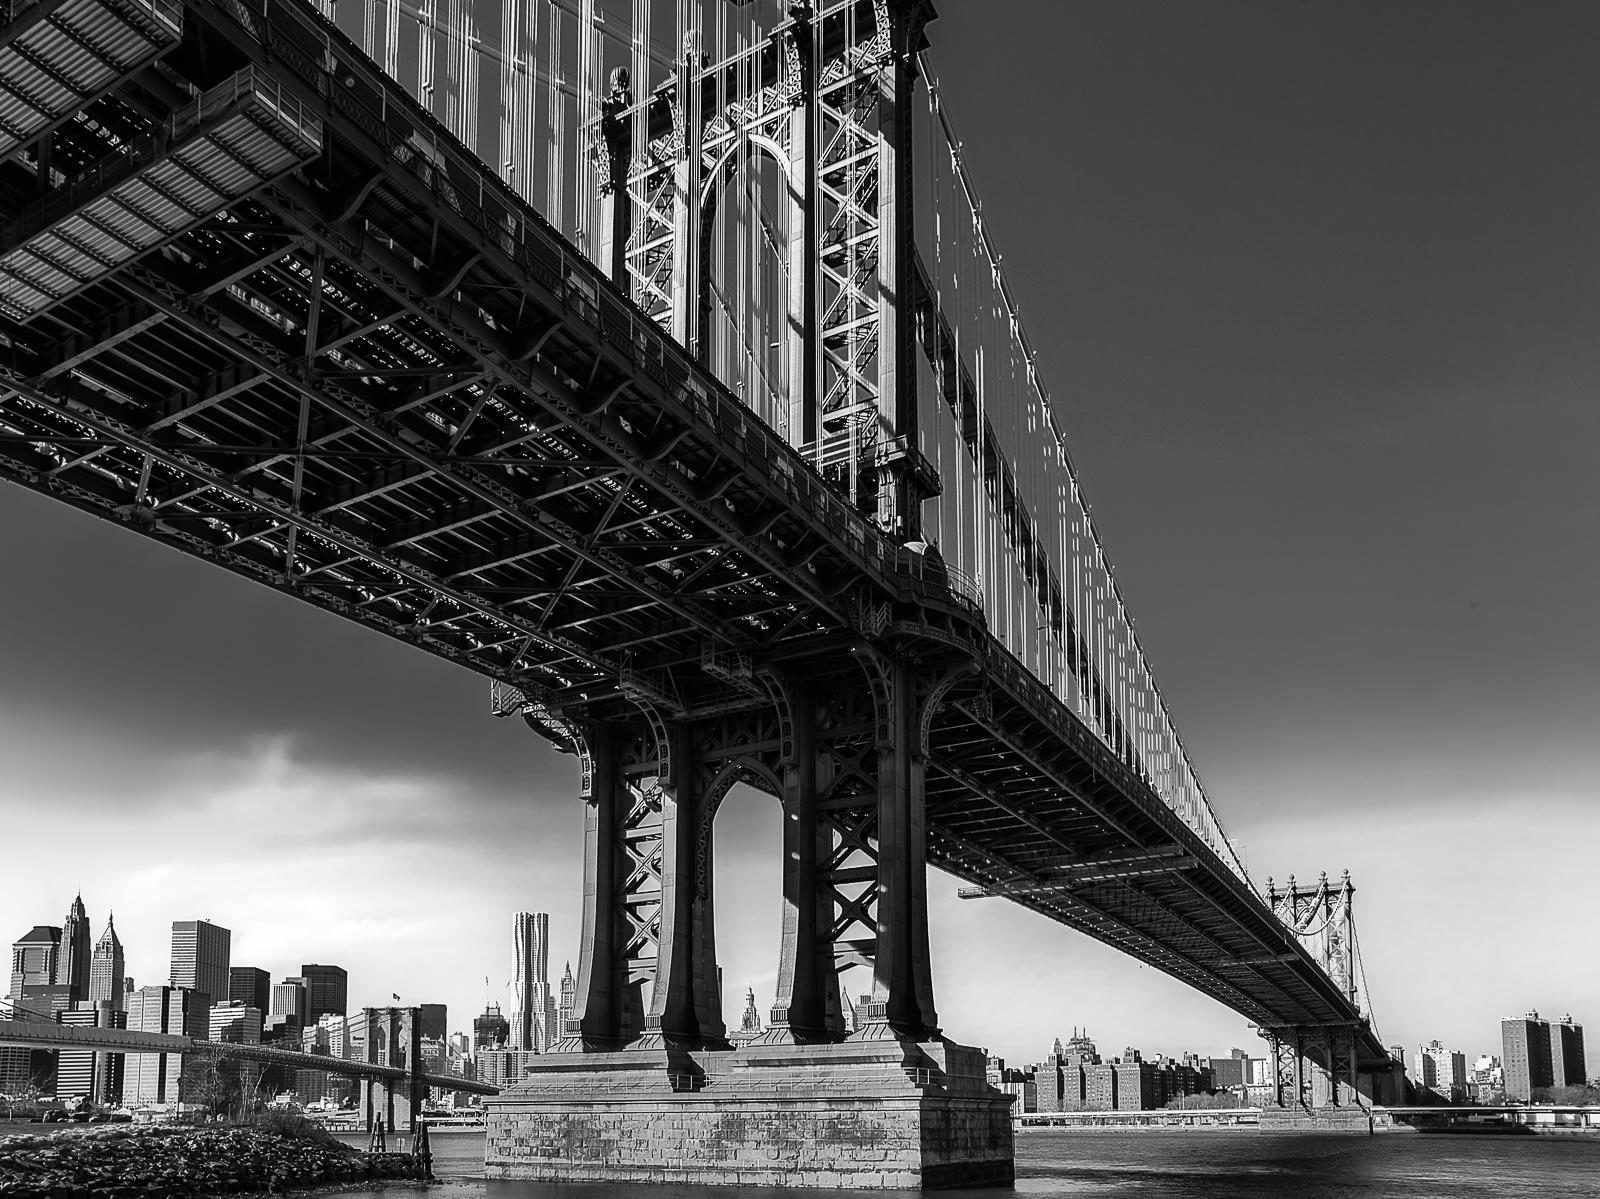 Manhattan Bridge, Black and White, Blue, Bridge, City Skyscape, Manhattan Bridge, New York, New York City, horizontal, BW, B&W, Black, White, photo